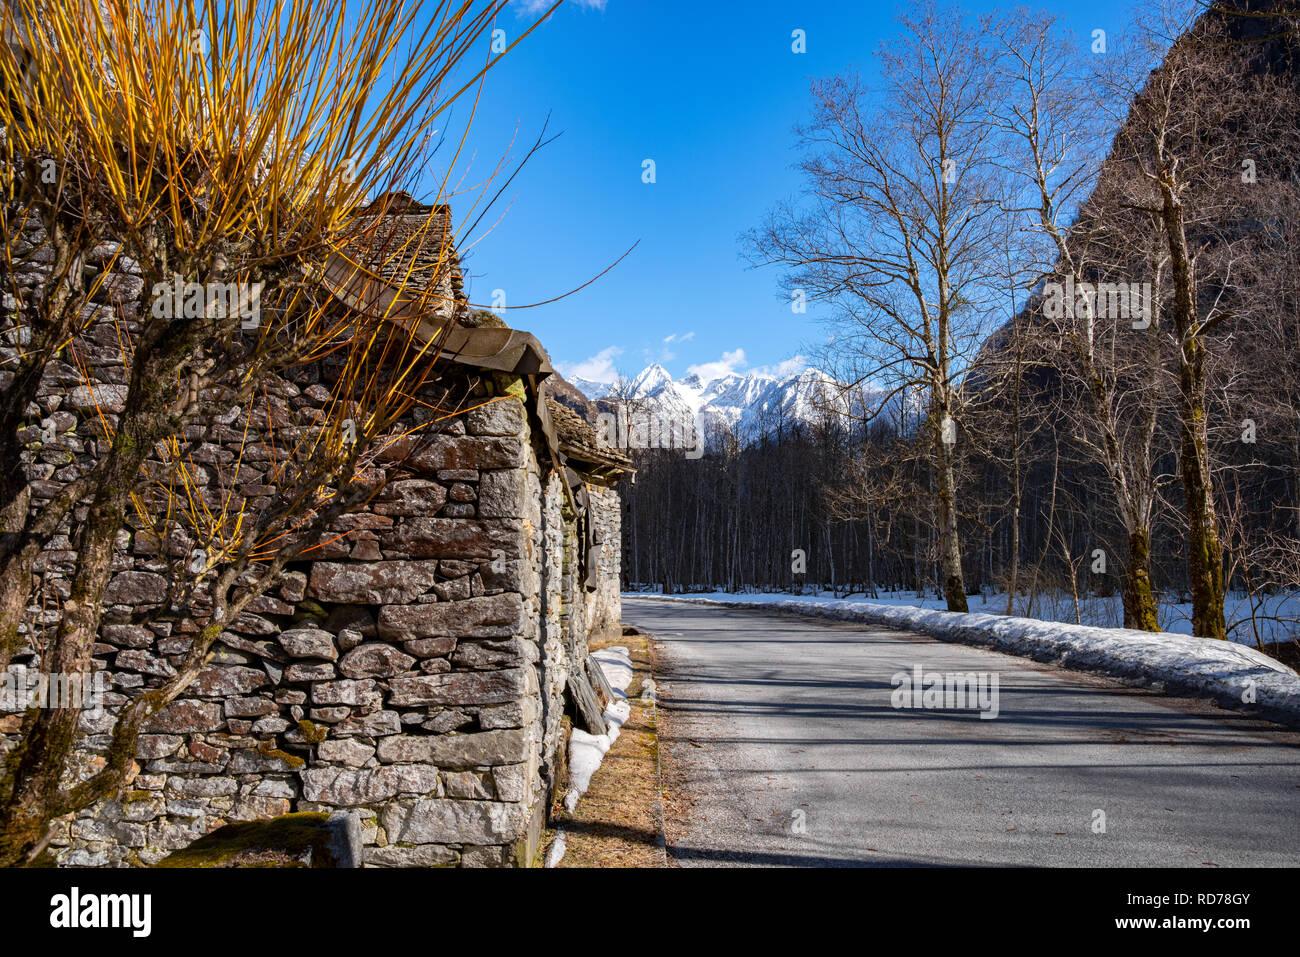 Europe, European Alps, Swiss Alps, Switzerland - Stock Image